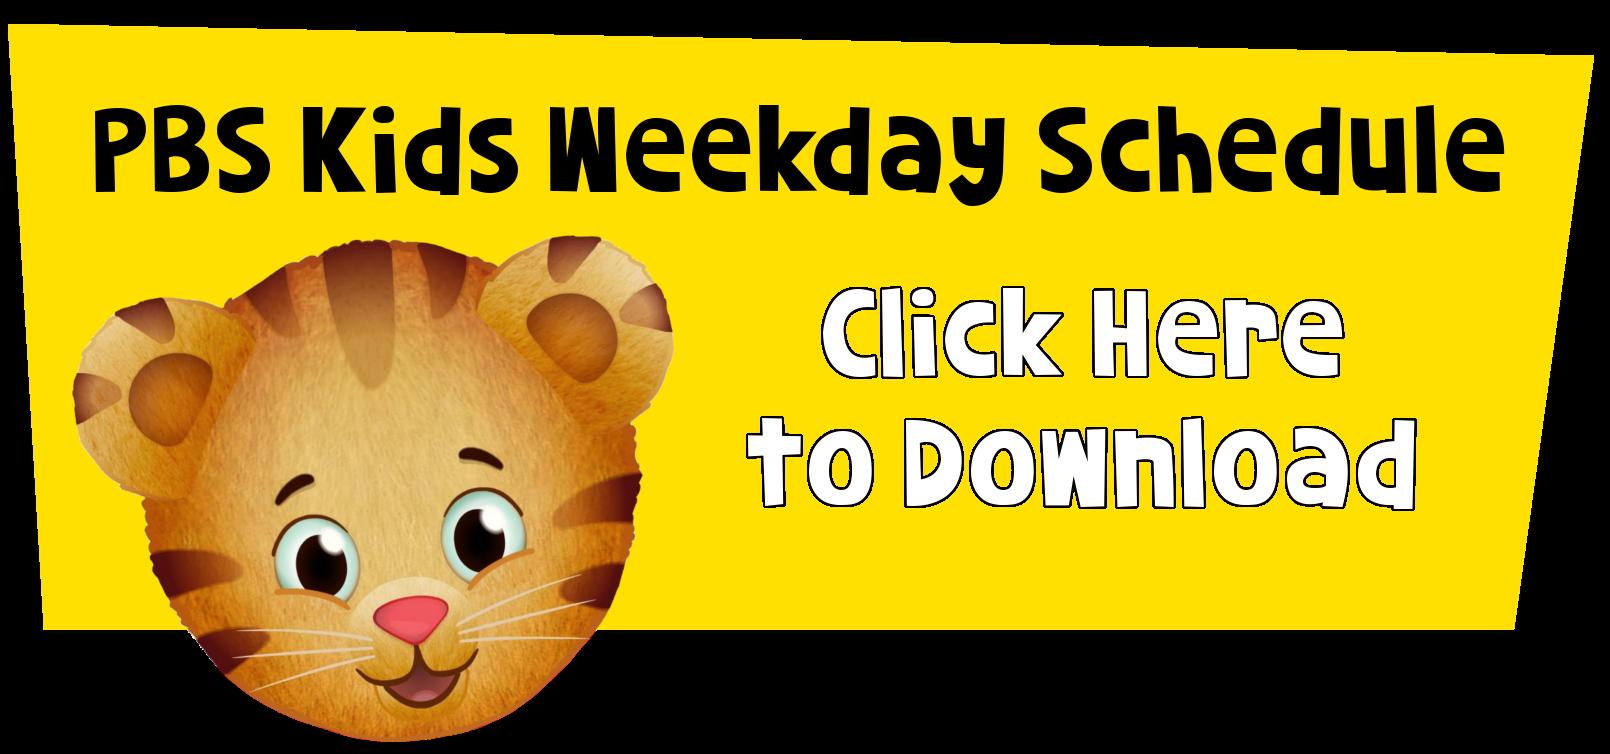 daniel tiger graphic to download schedule